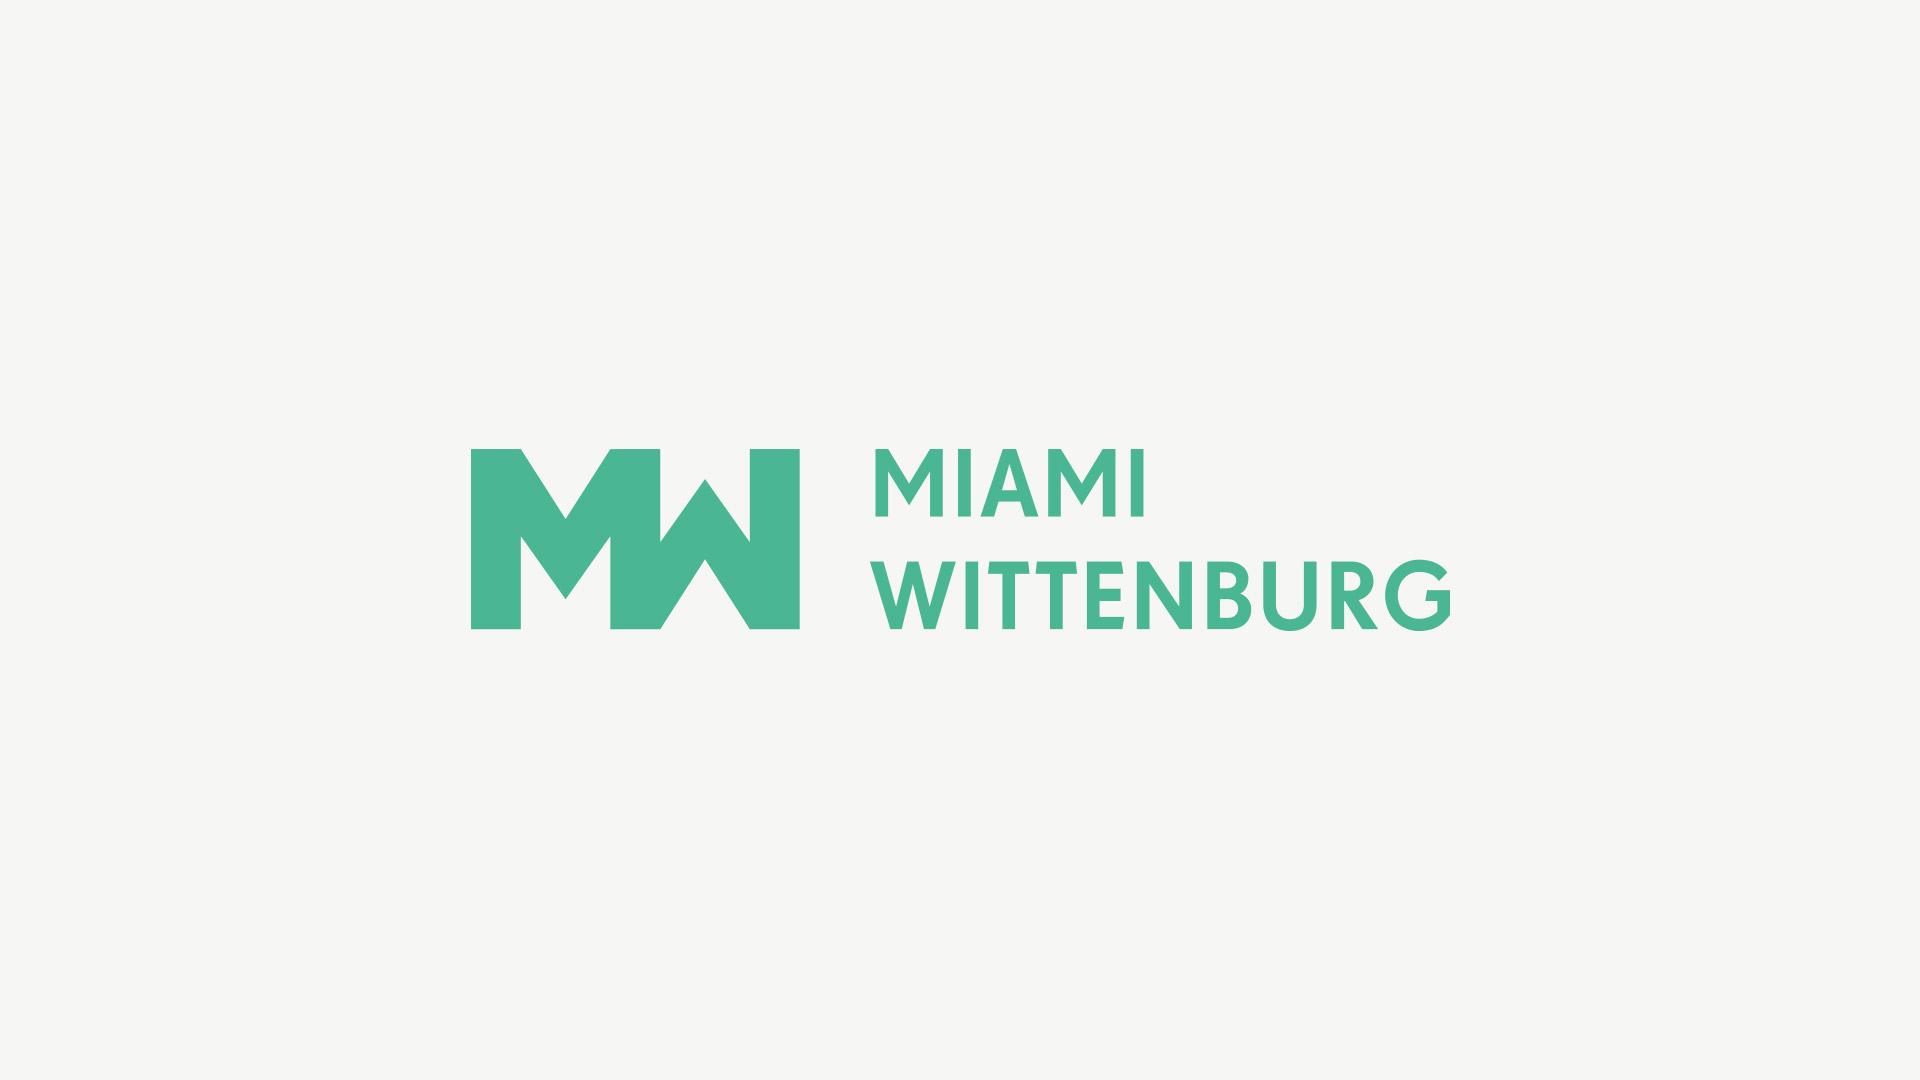 Miami Wittenburg